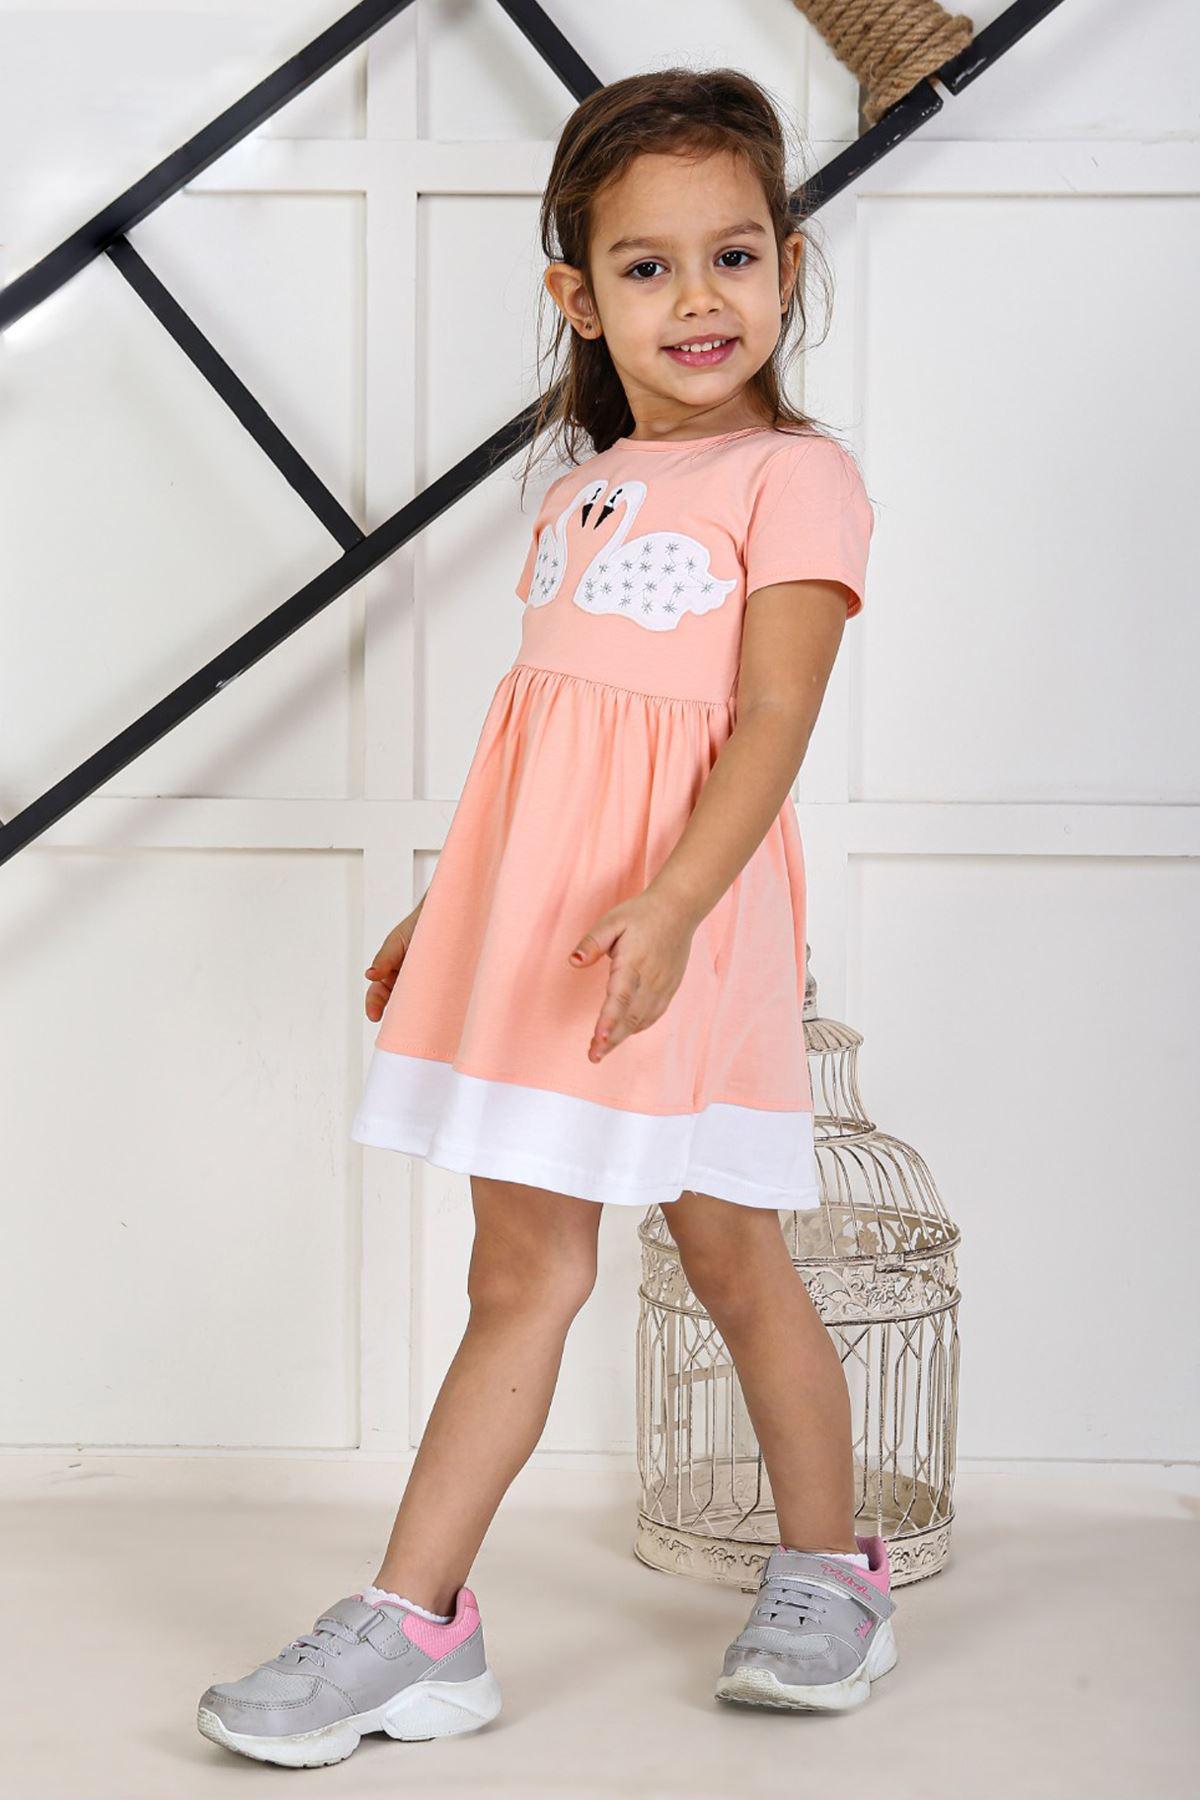 Powder Pink Kids 2021 Girls Girls' Skirt Dress Suits Cotton Casual Summer Children Clothing Girl Dress Cute Holiday Outfits Sports